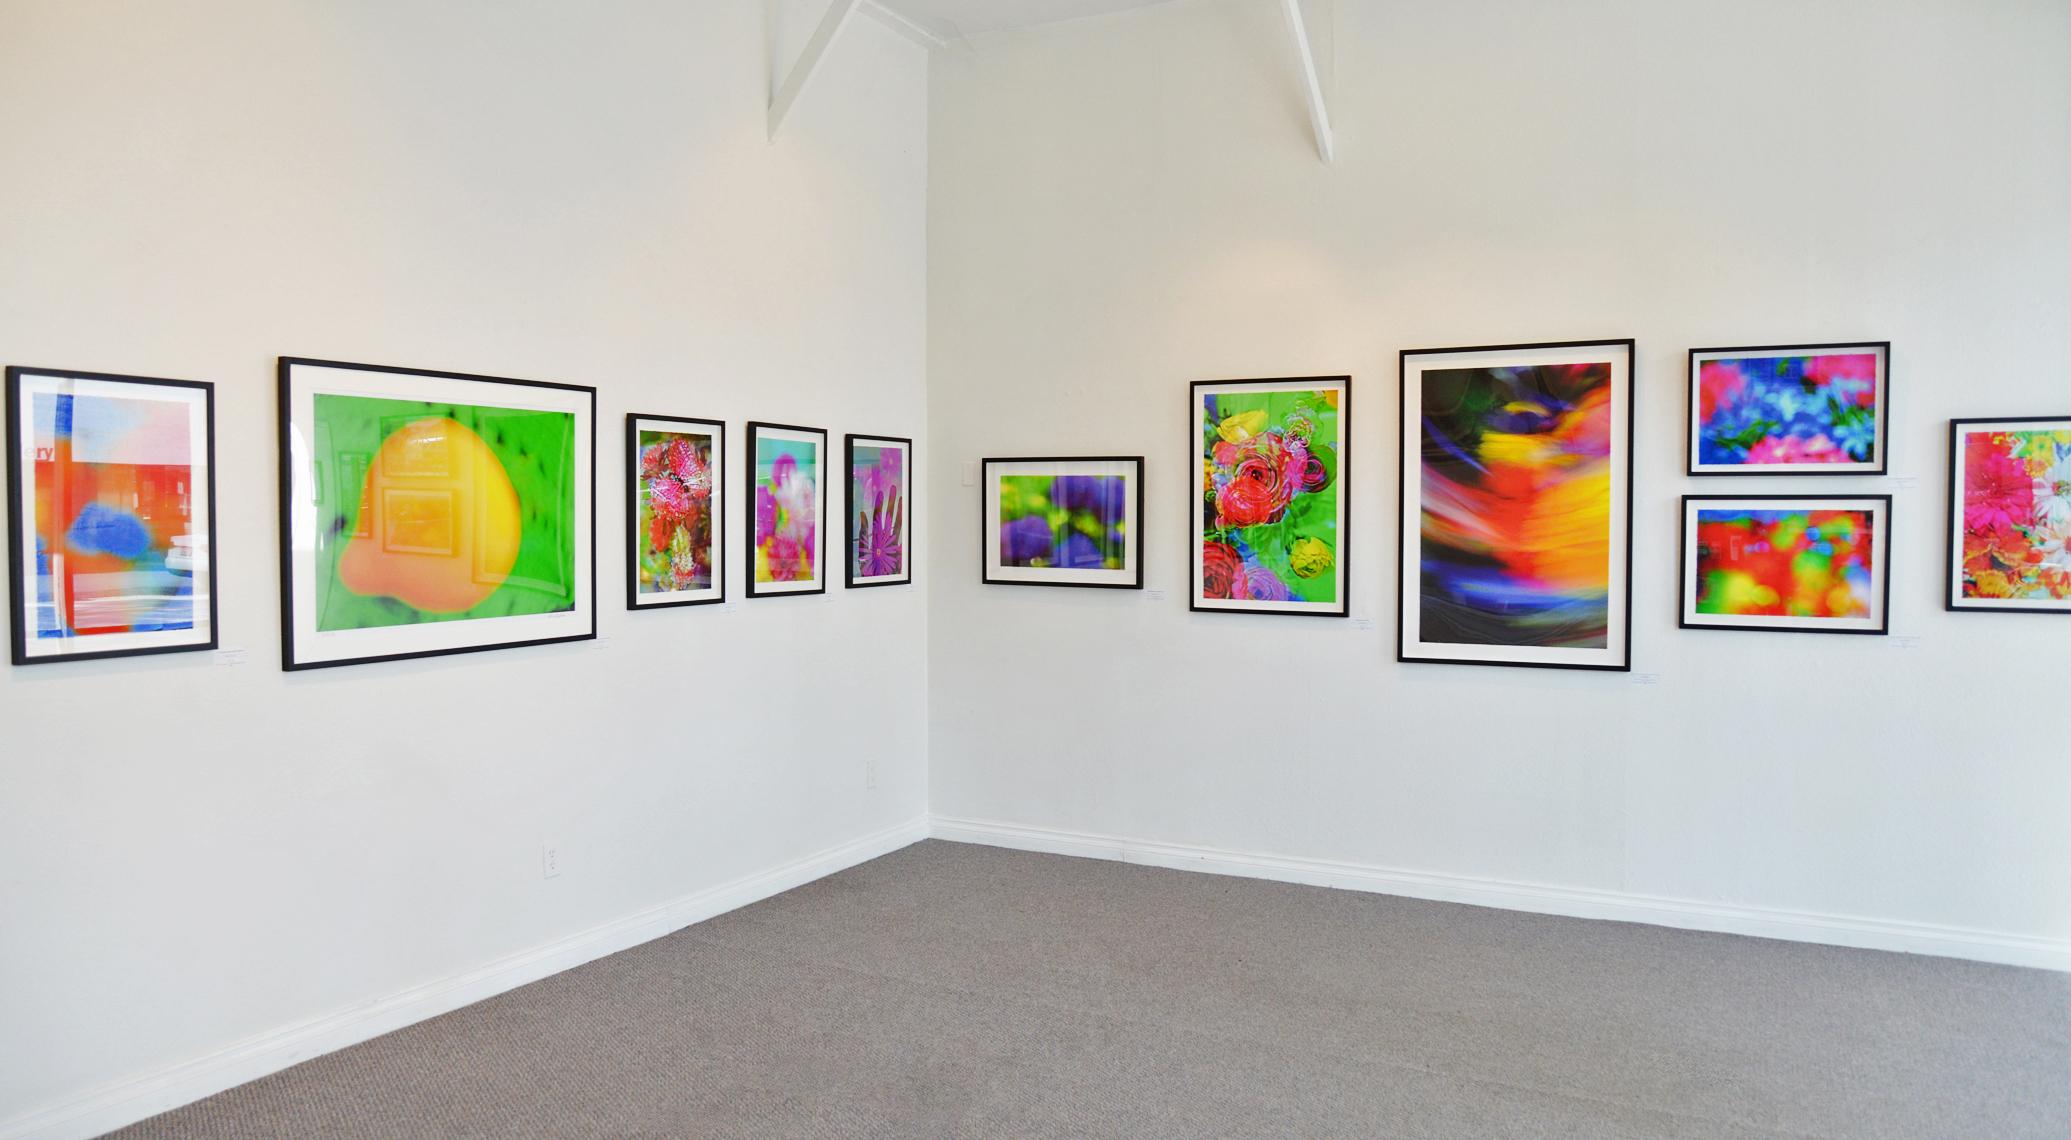 Johnny Nicoloro, APRIL at Metro Art Gallery, Pomona April 2104